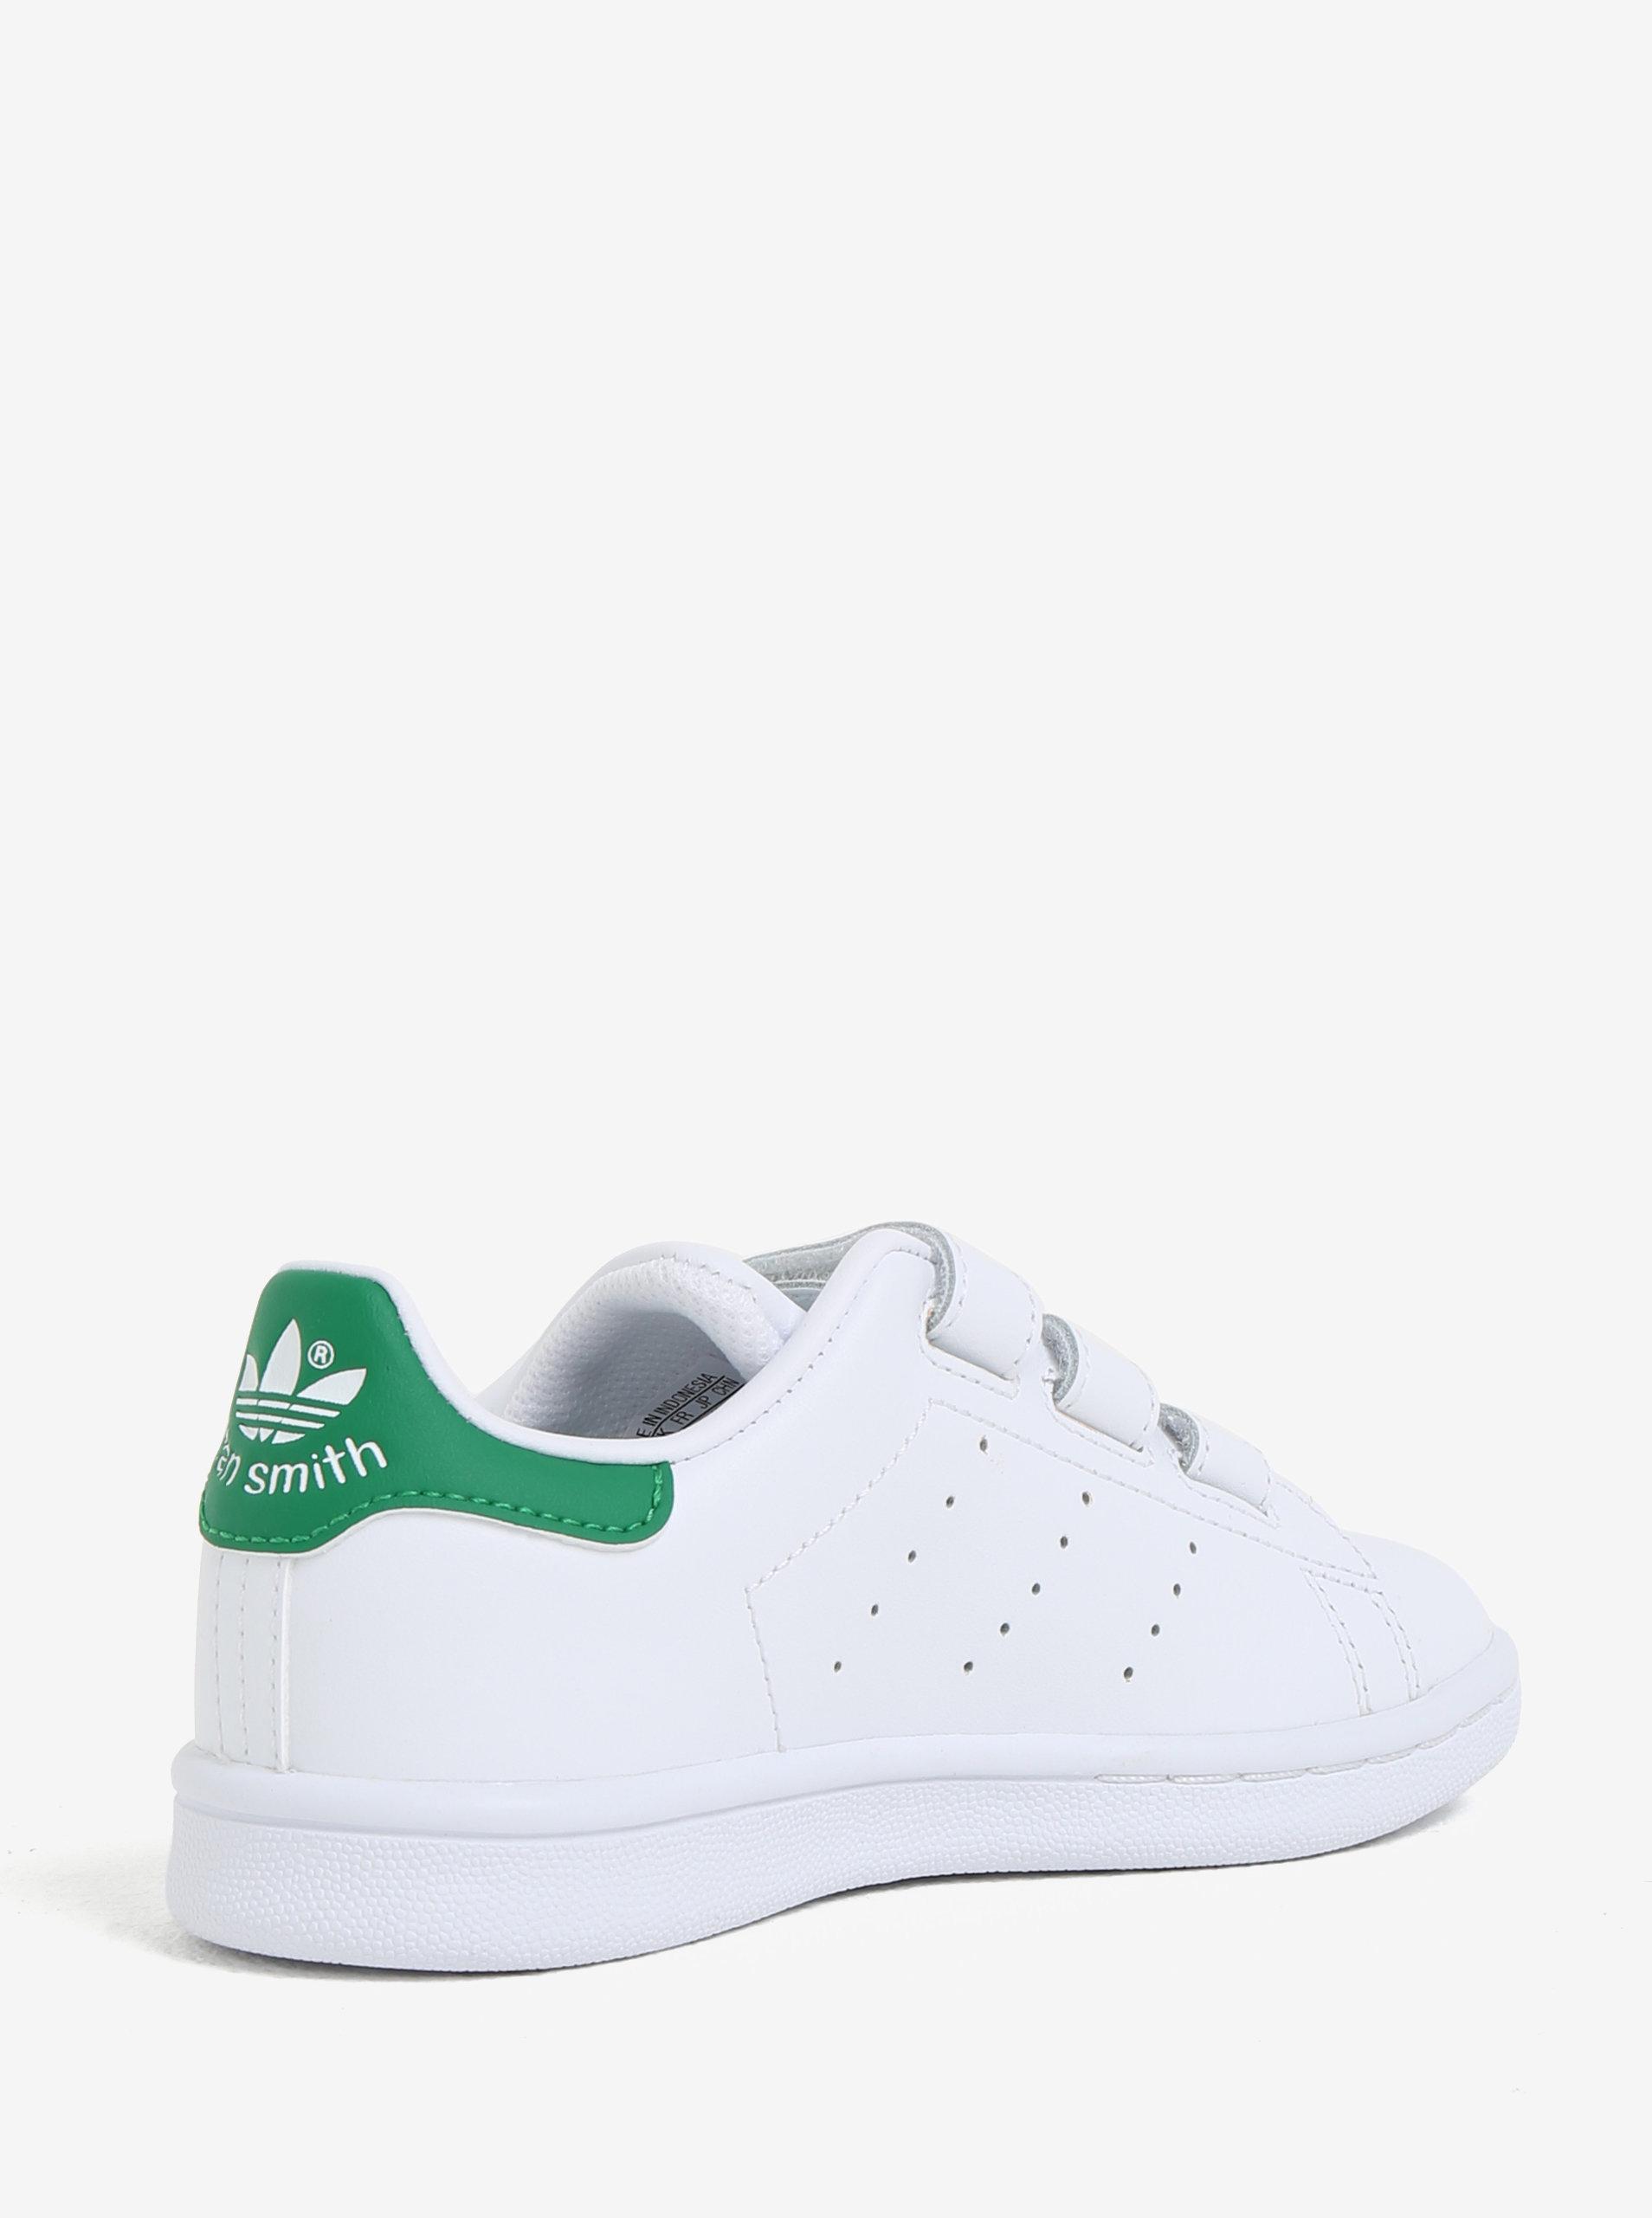 Bílé dětské kožené tenisky na suchý zip adidas Originals Stan Smith Cf C ... c808a0efb8